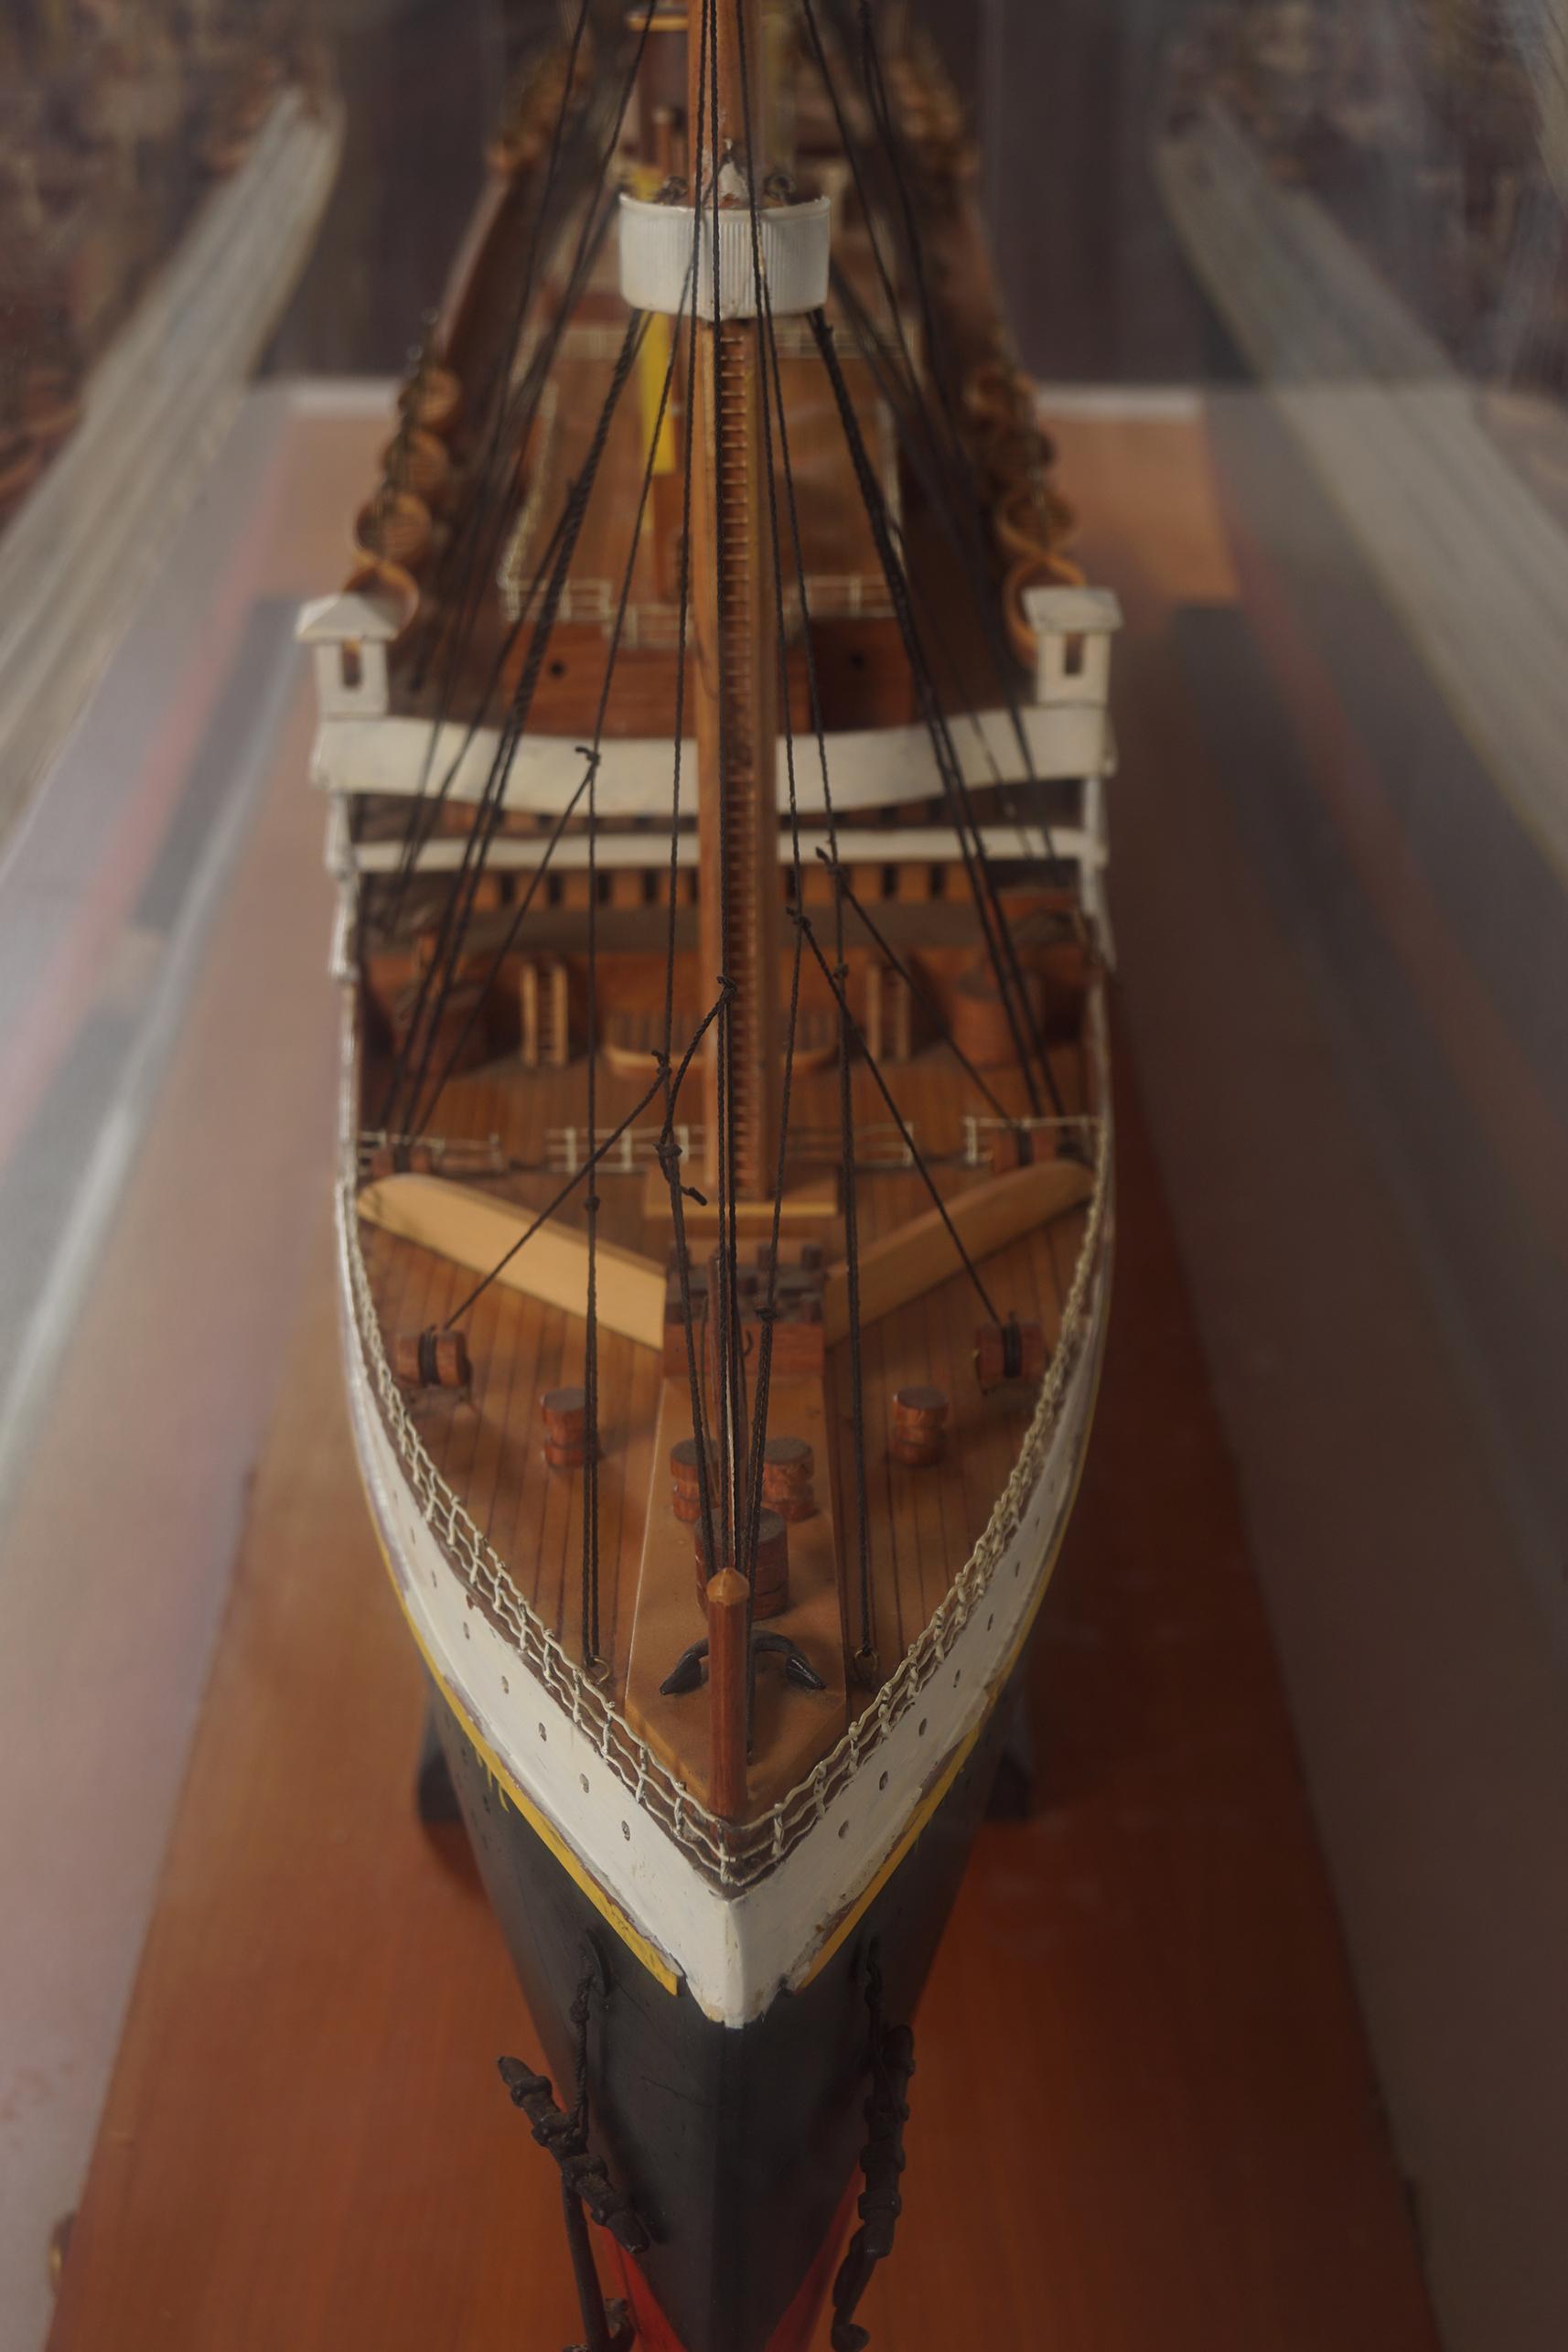 LARGE MODEL STEAM SHIP - Image 8 of 8